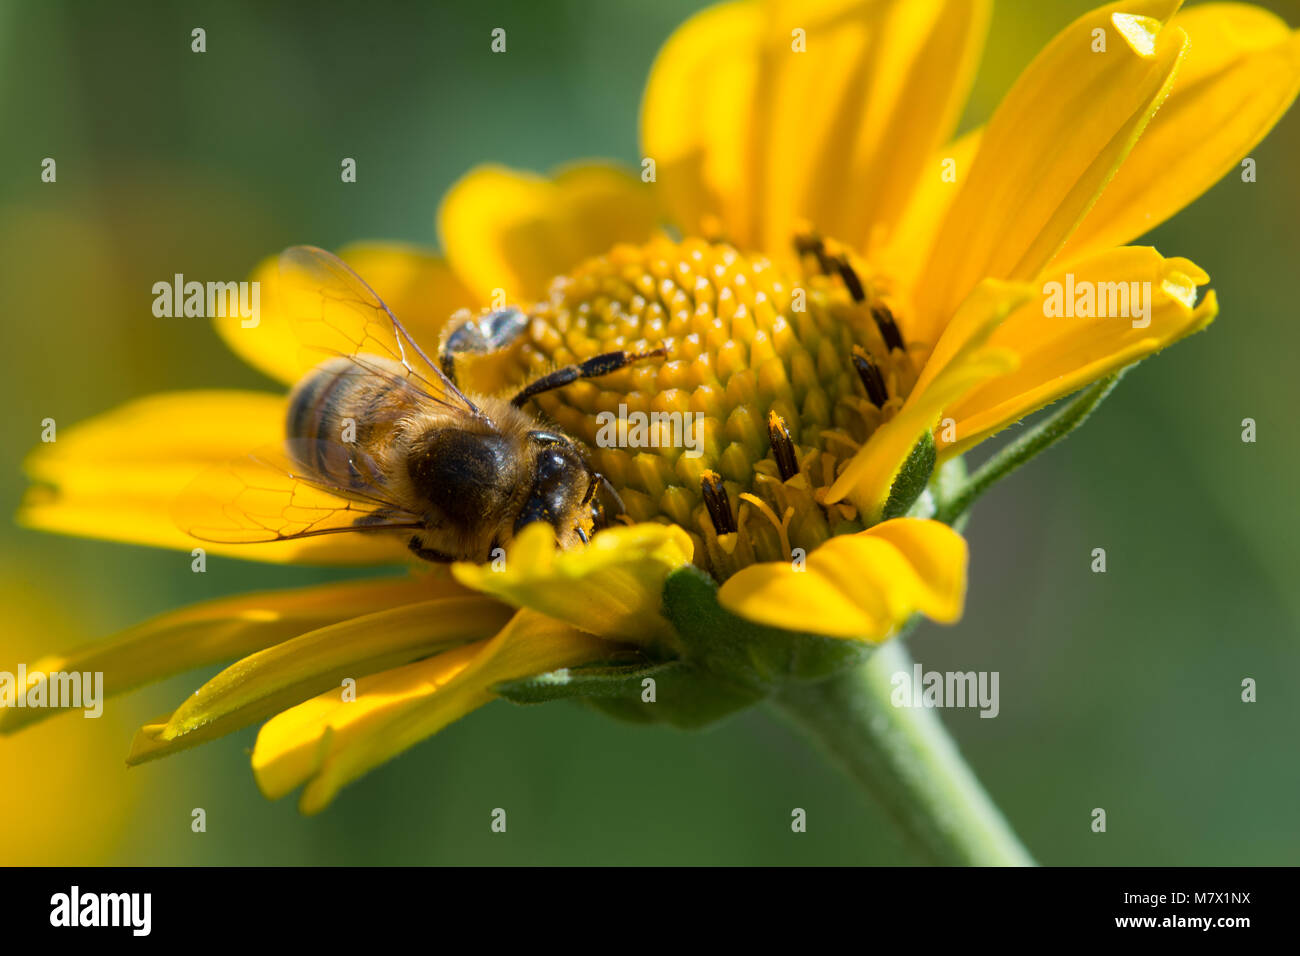 close up macro of western honey bee apis mellifera on yellow  flower collecting nectar - Stock Image